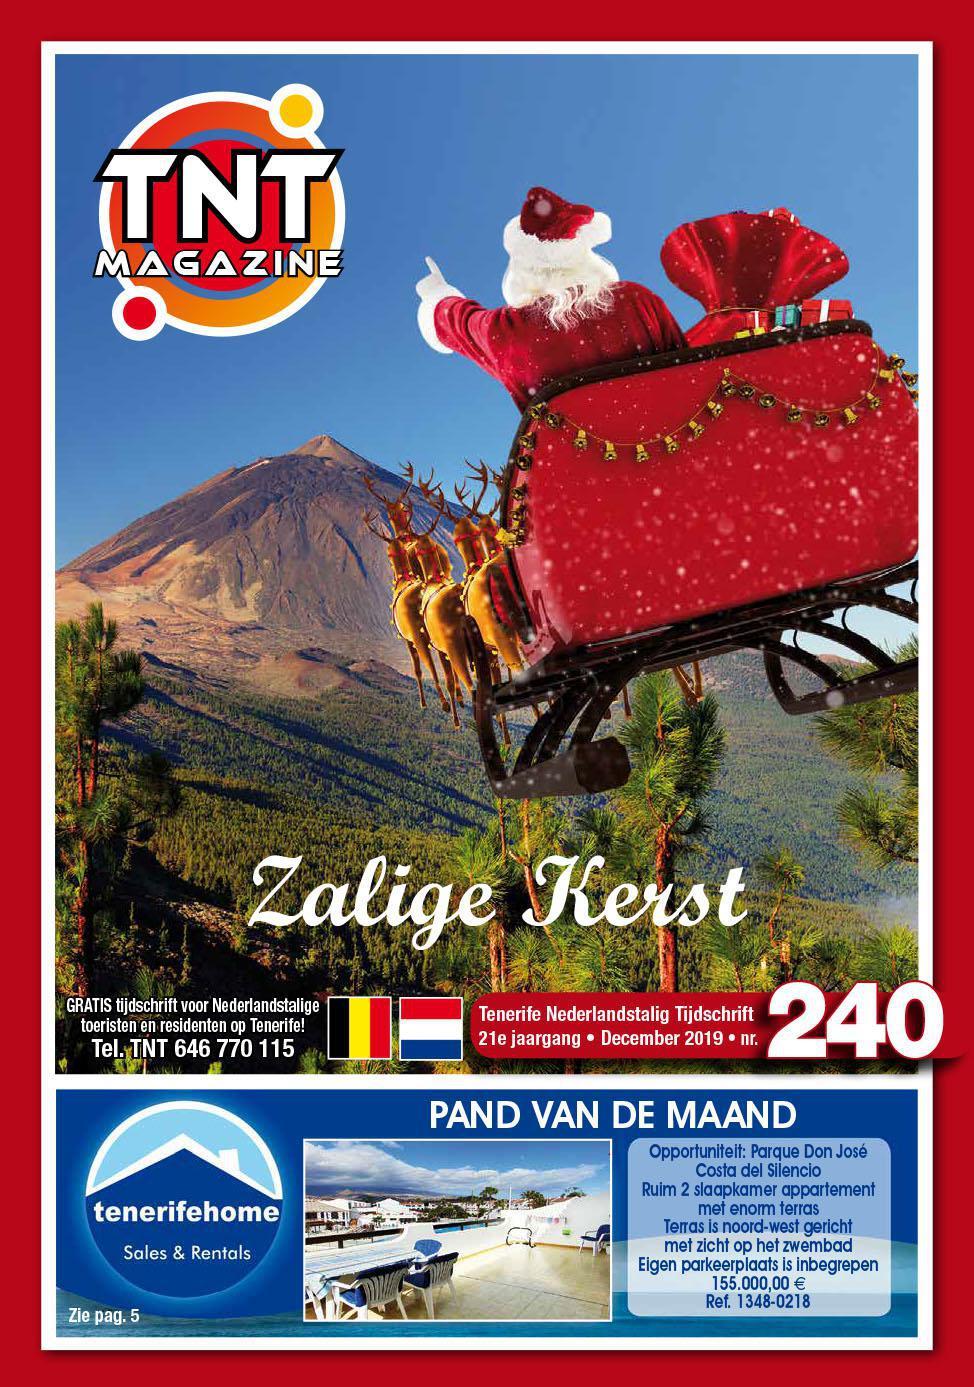 TNT Magazine - December 2019 - nr. 240